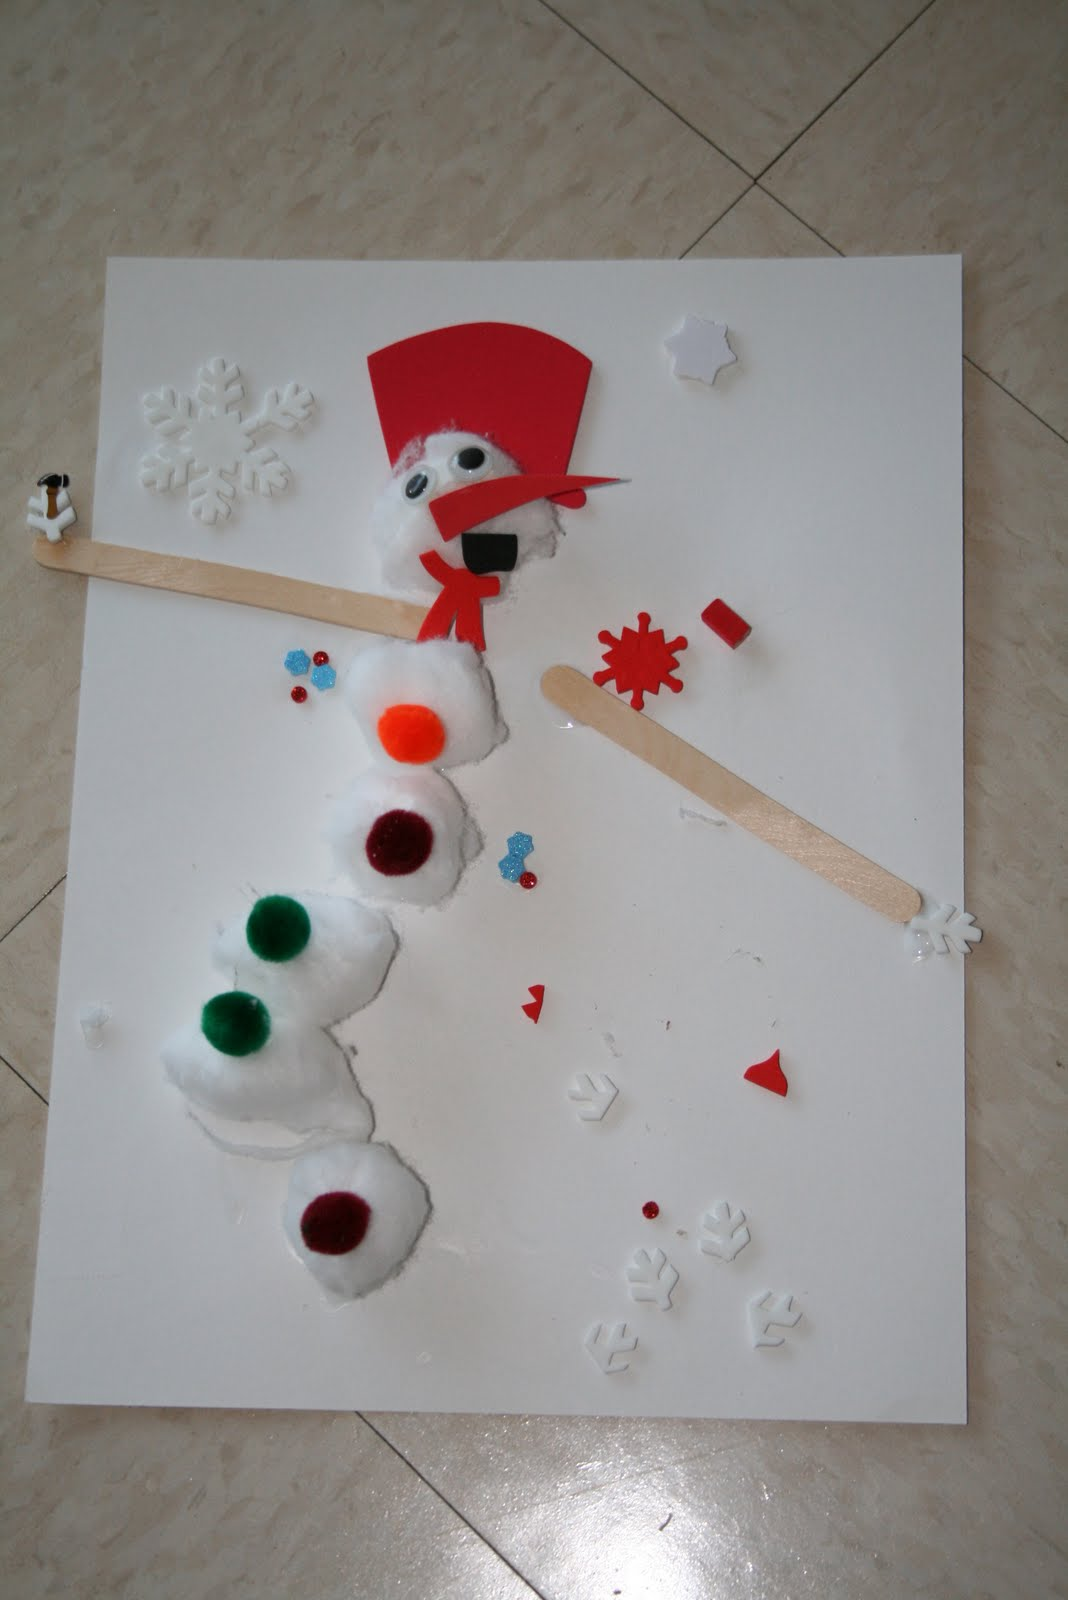 Christmas Art And Craft Ideas For Preschoolers Part - 27: Educating Crumpet: Preschool Week Of 12/17